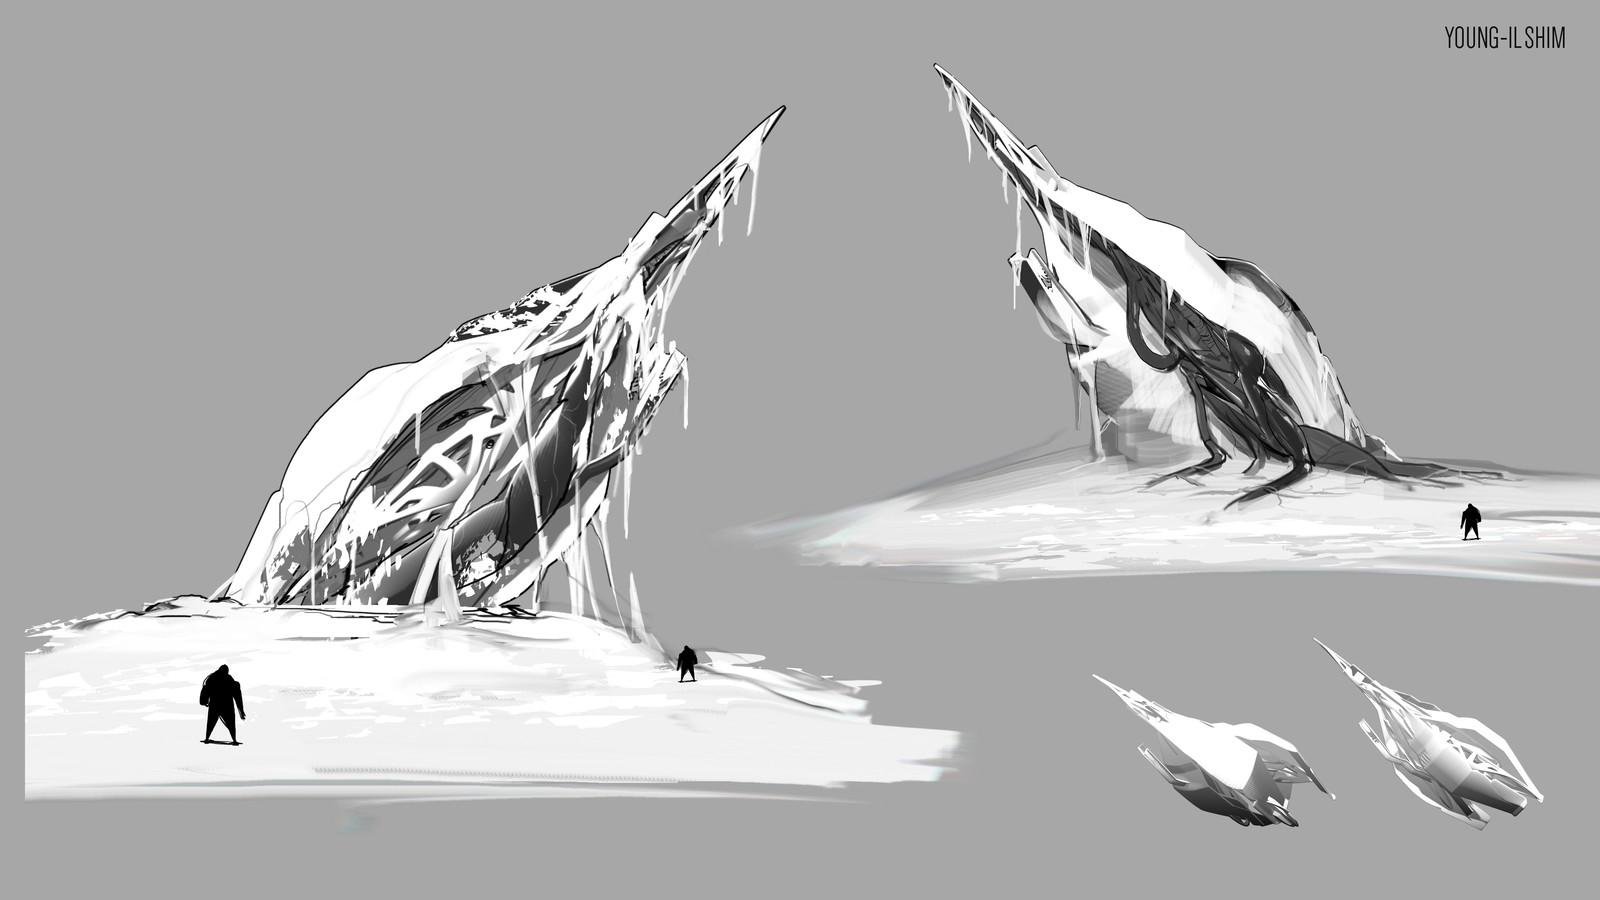 Spaceship Wreck